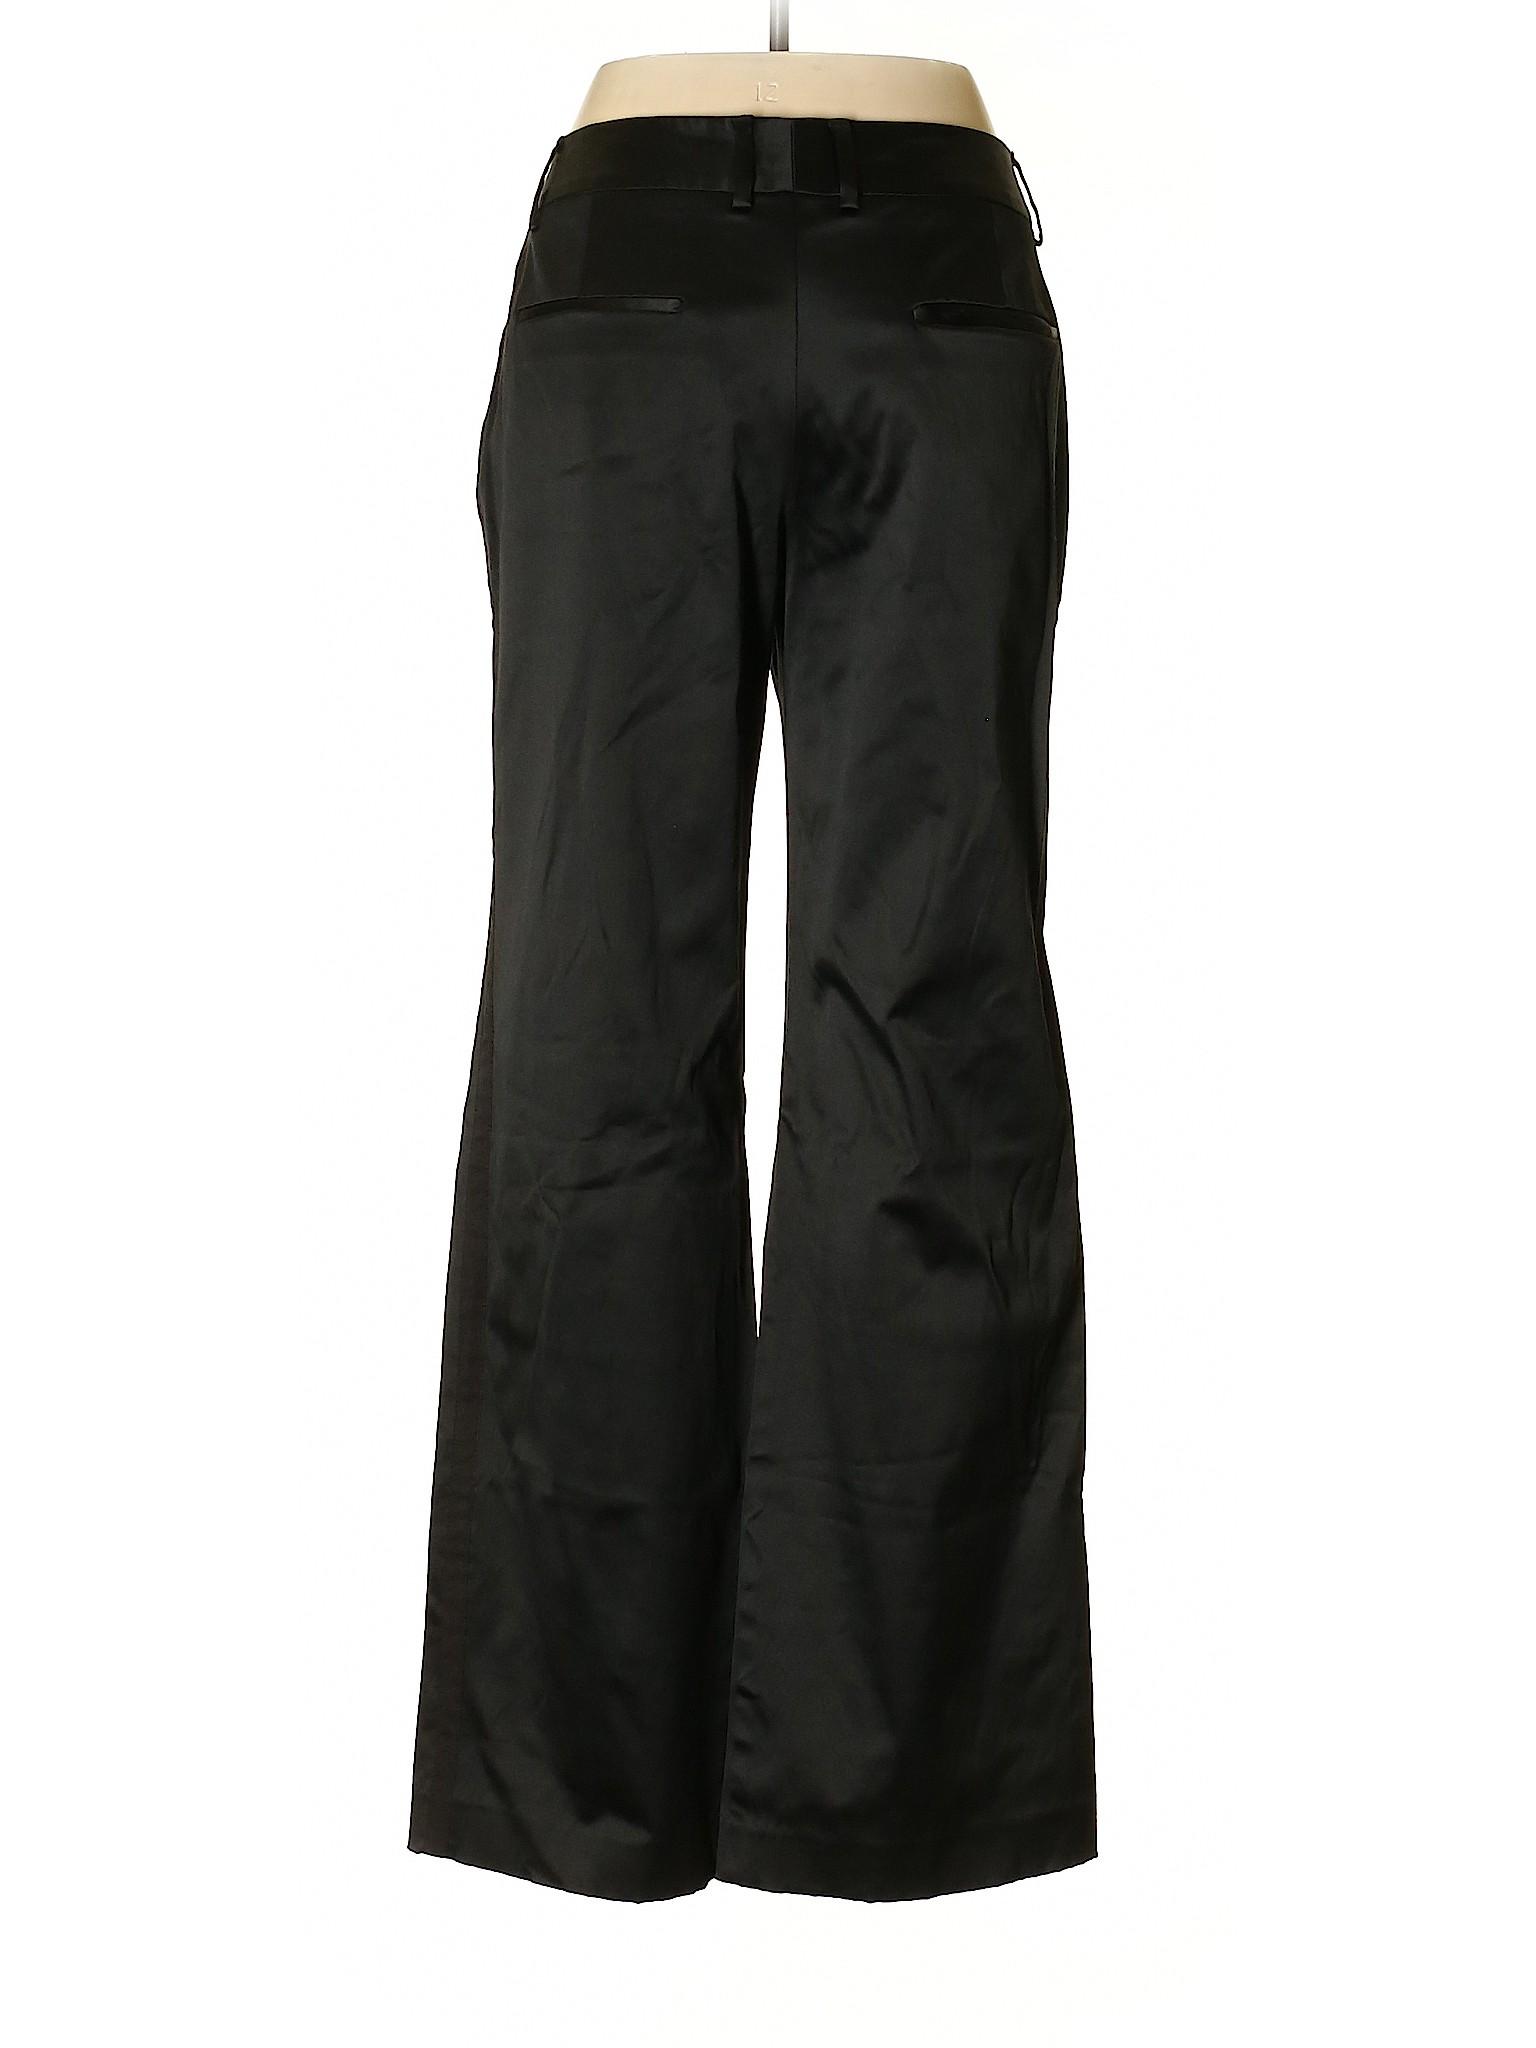 198607a468 Jeans Skirts Target | Huston Fislar Photography